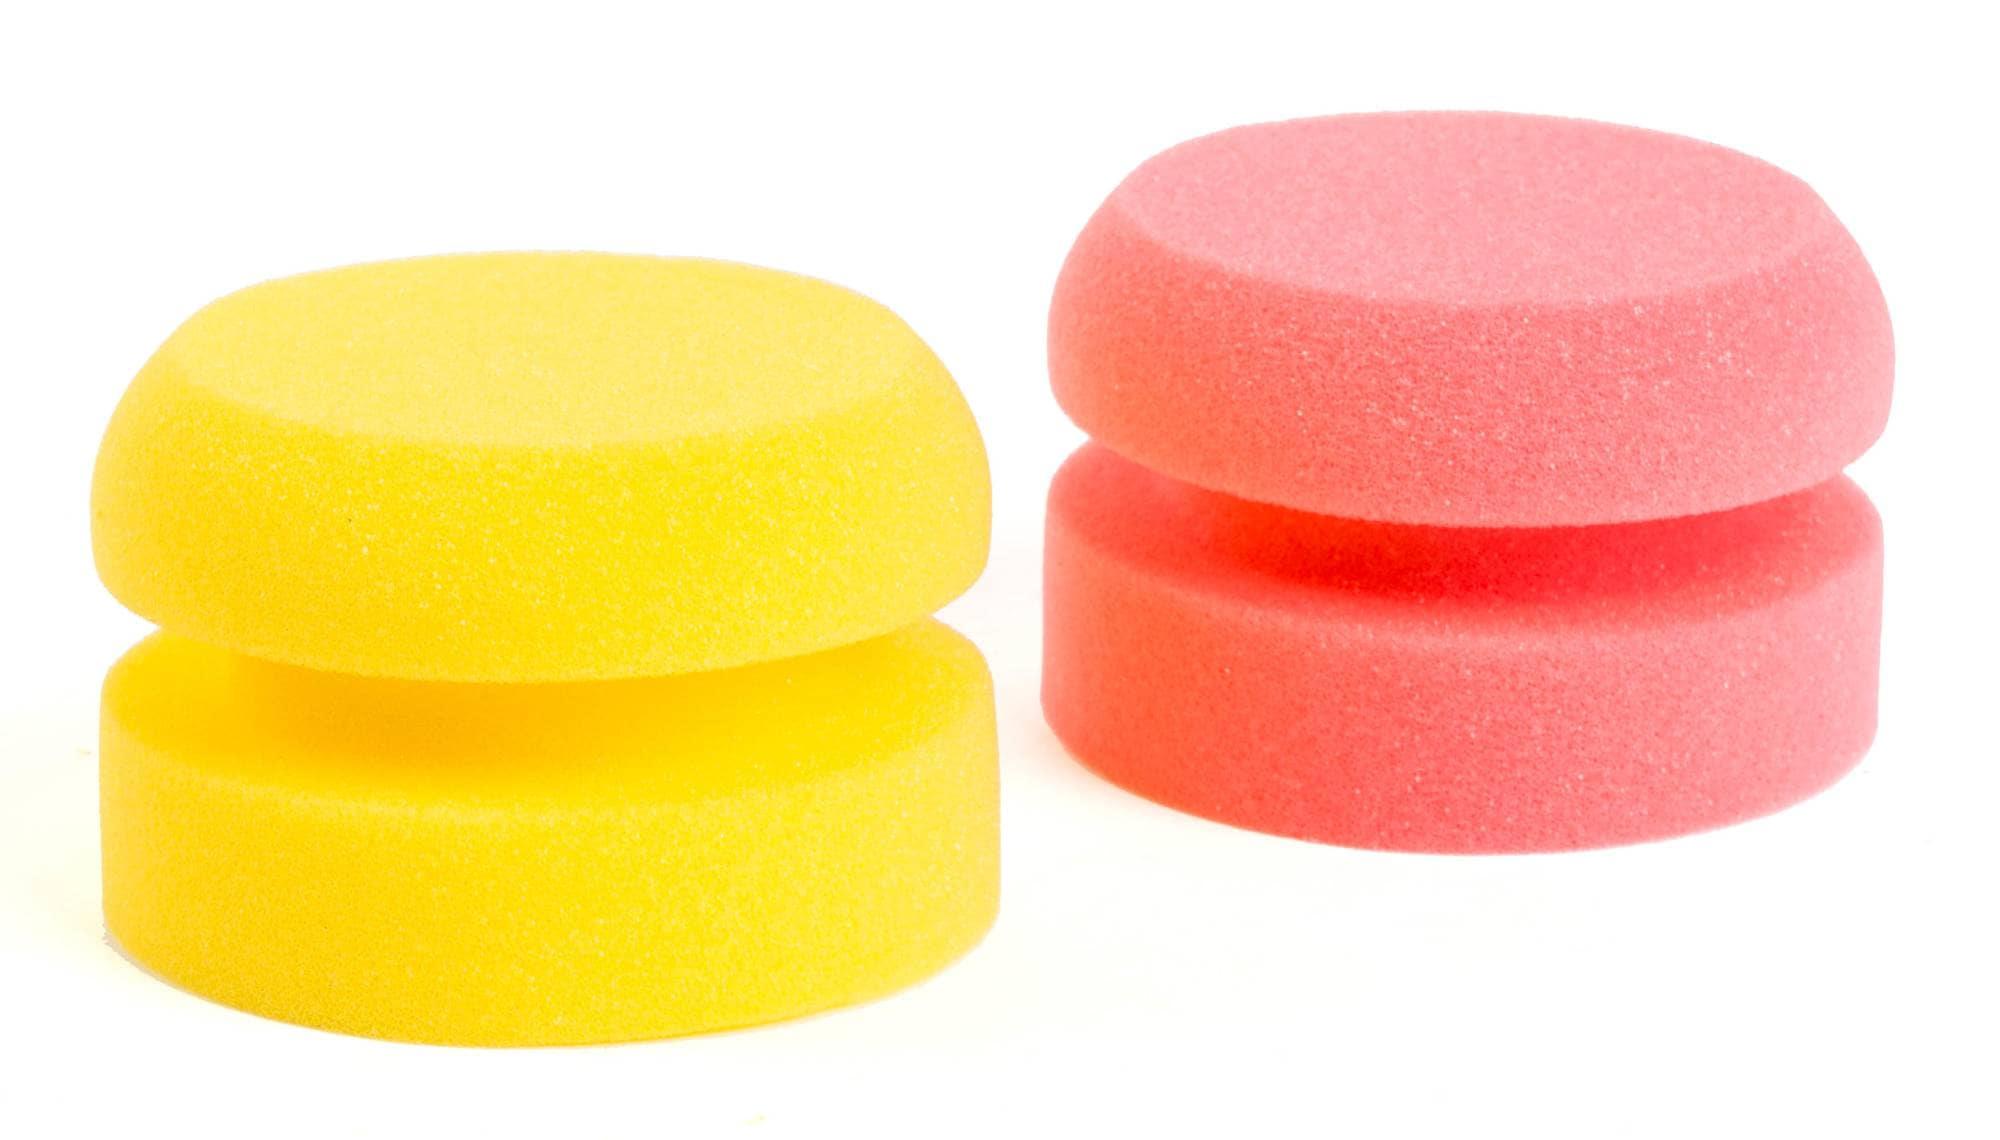 Ergonomic sponge round